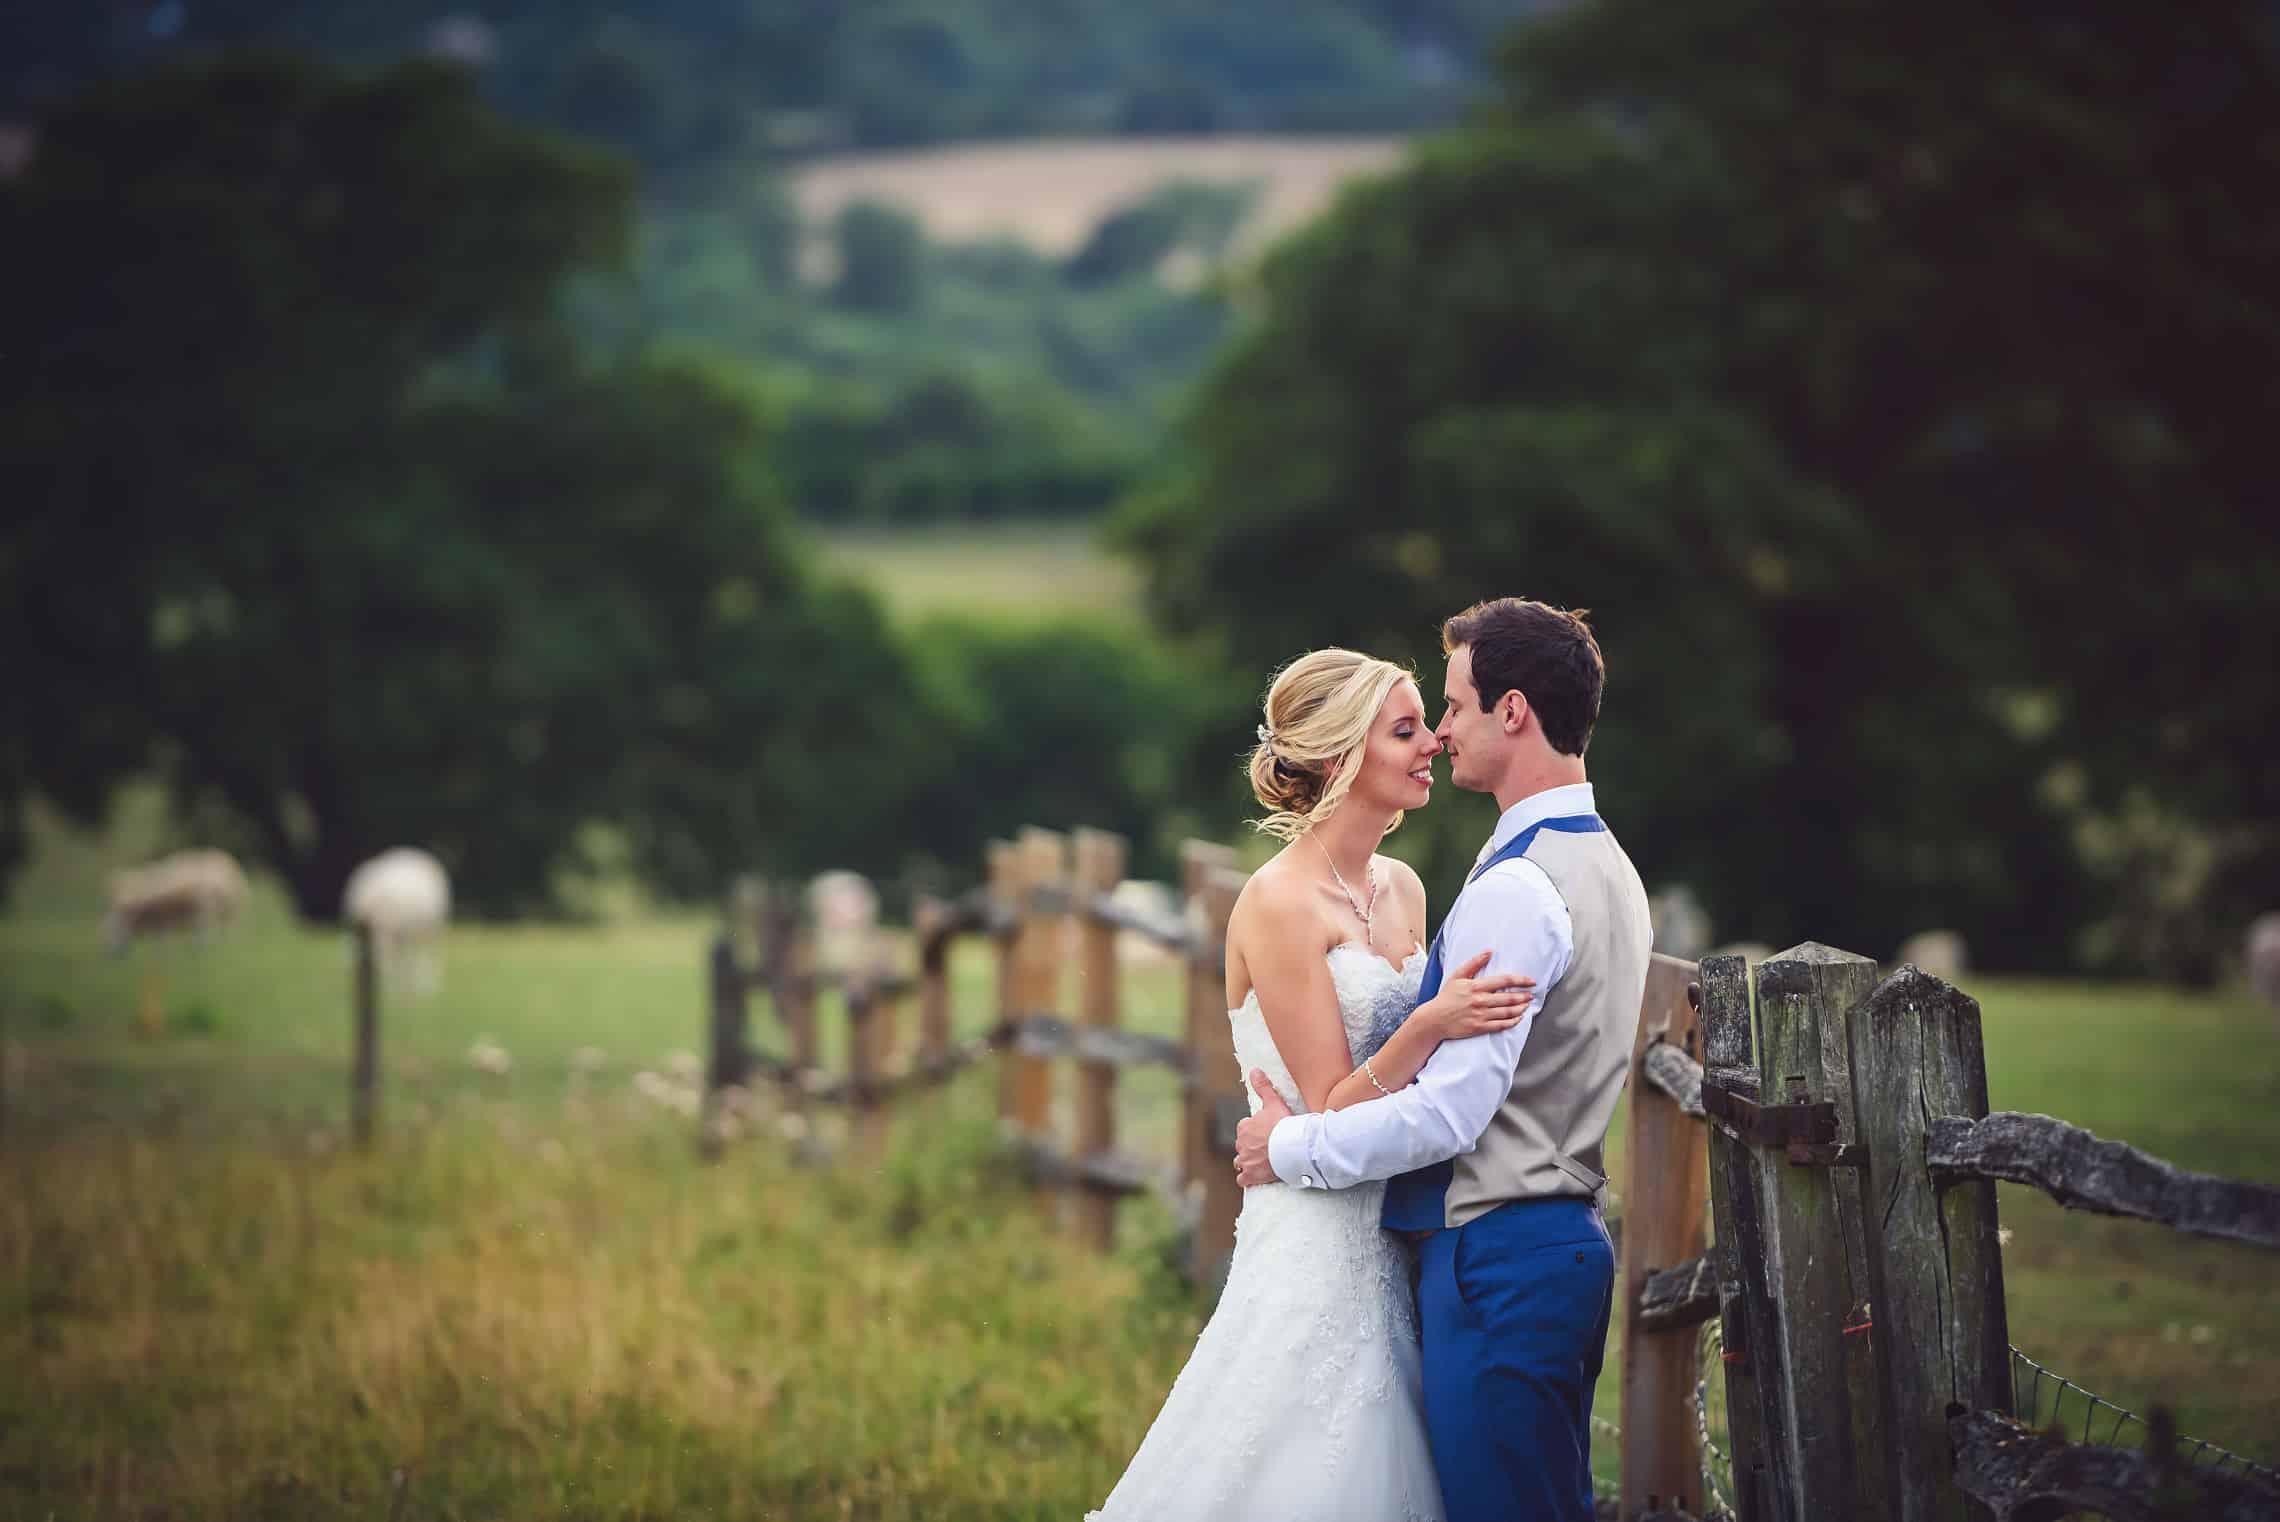 gaynes_park_wedding_lm_justin_bailey_photography_016